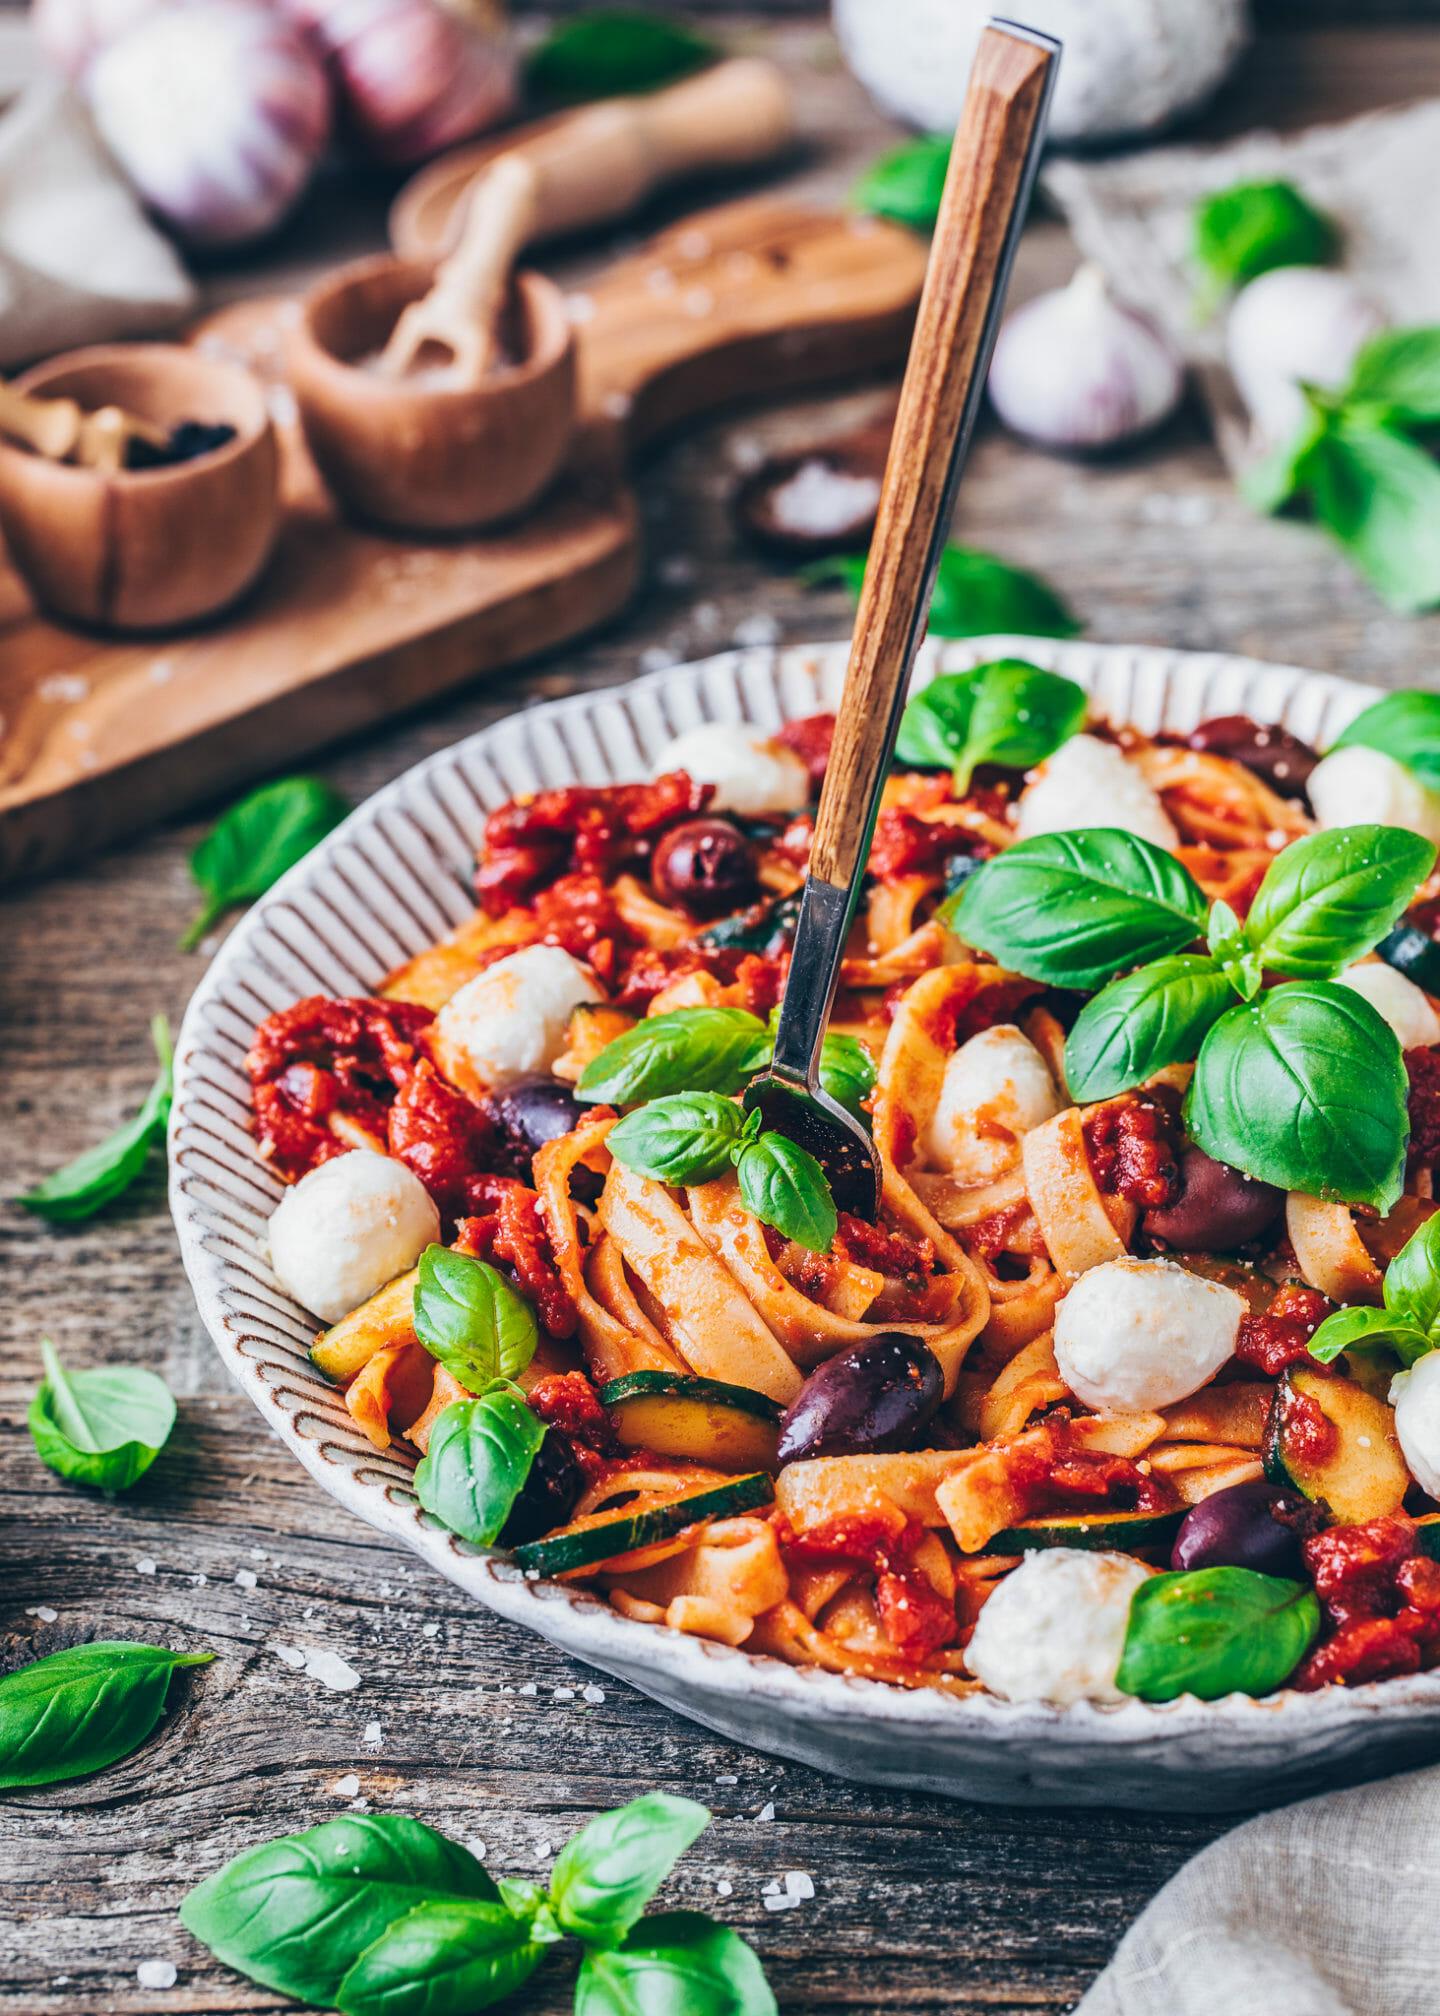 One-Pot Pasta with Vegan Mozzarella, Cashew Parmesan, Olives, and Basil